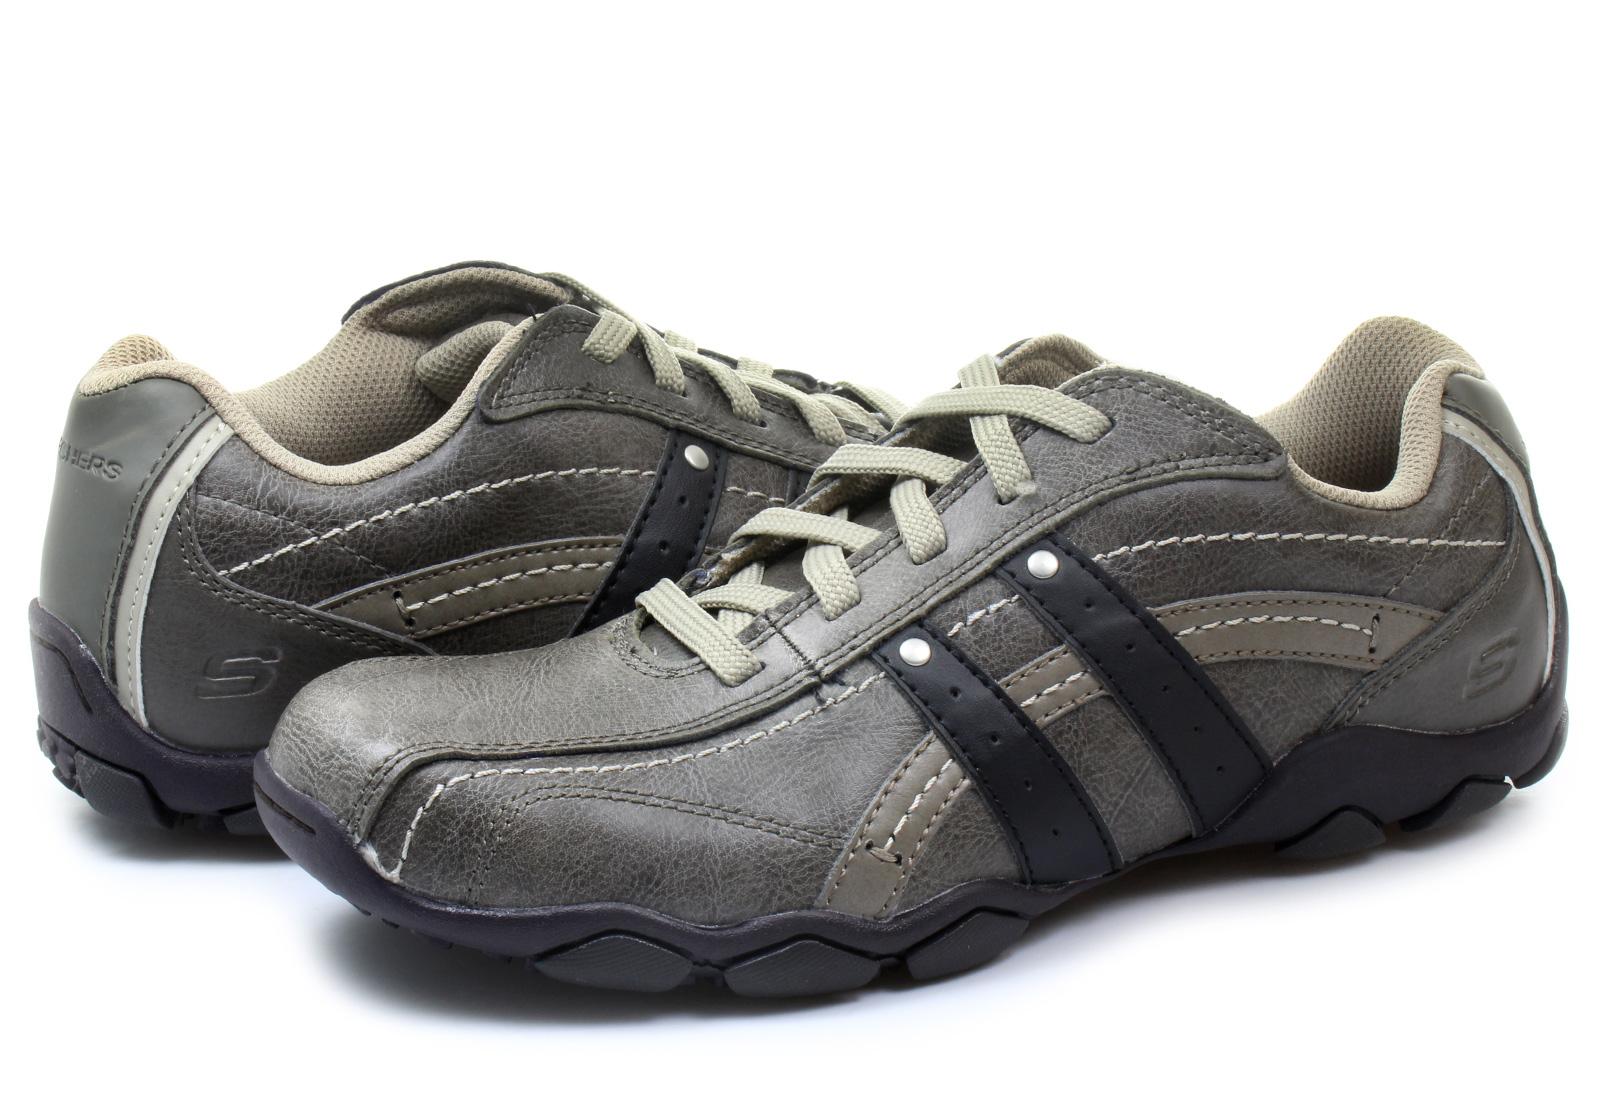 Skechers Shoes - Diameter- Blake - 63385-CHAR - Online shop for ... 0e4f97b3313